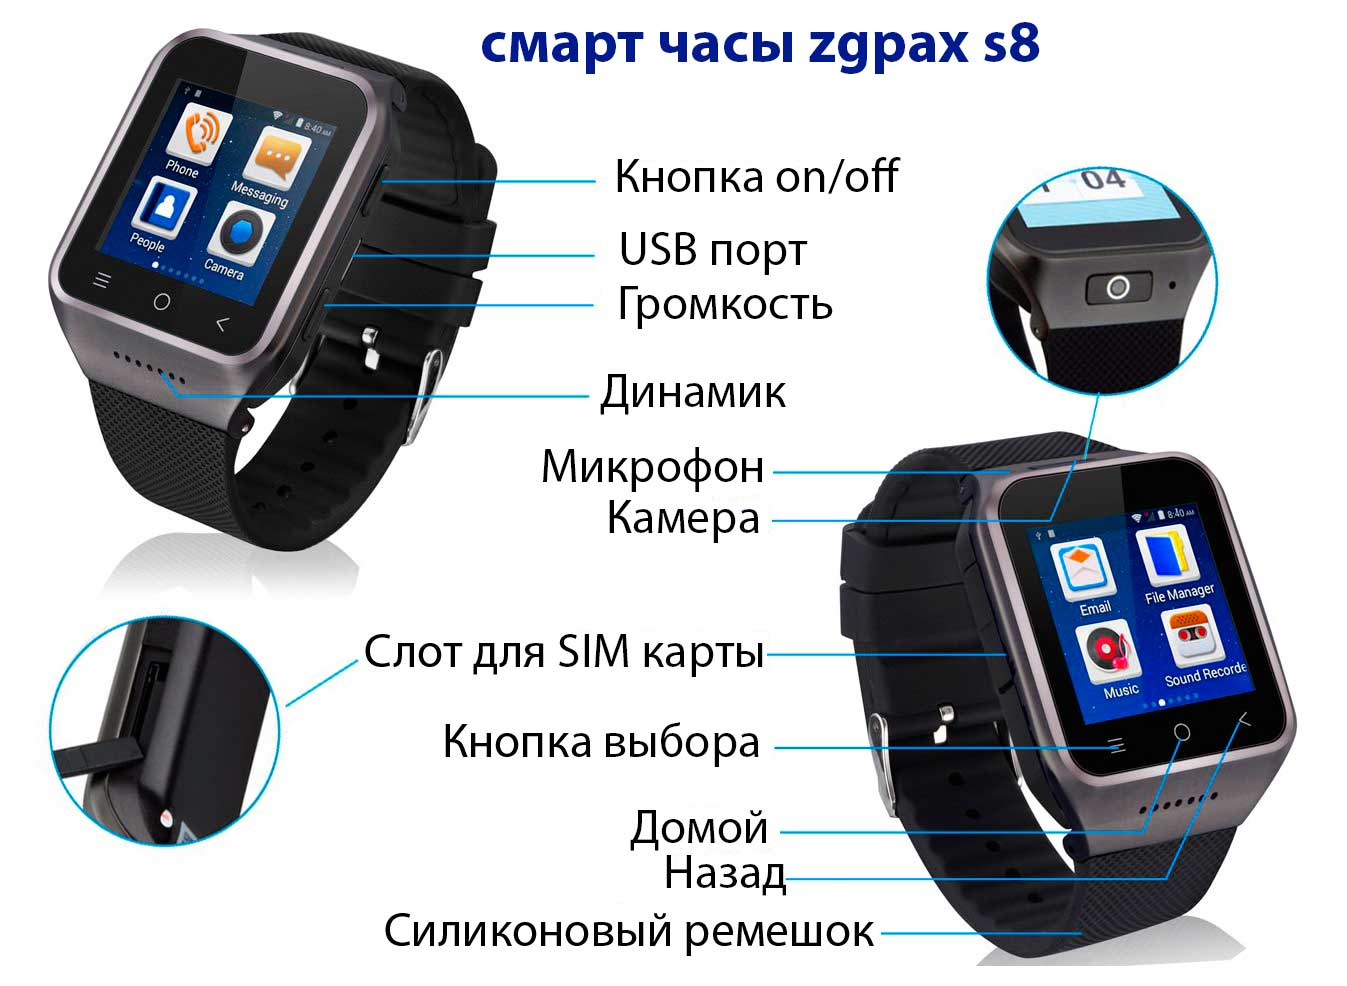 смарт часы zgpax s8